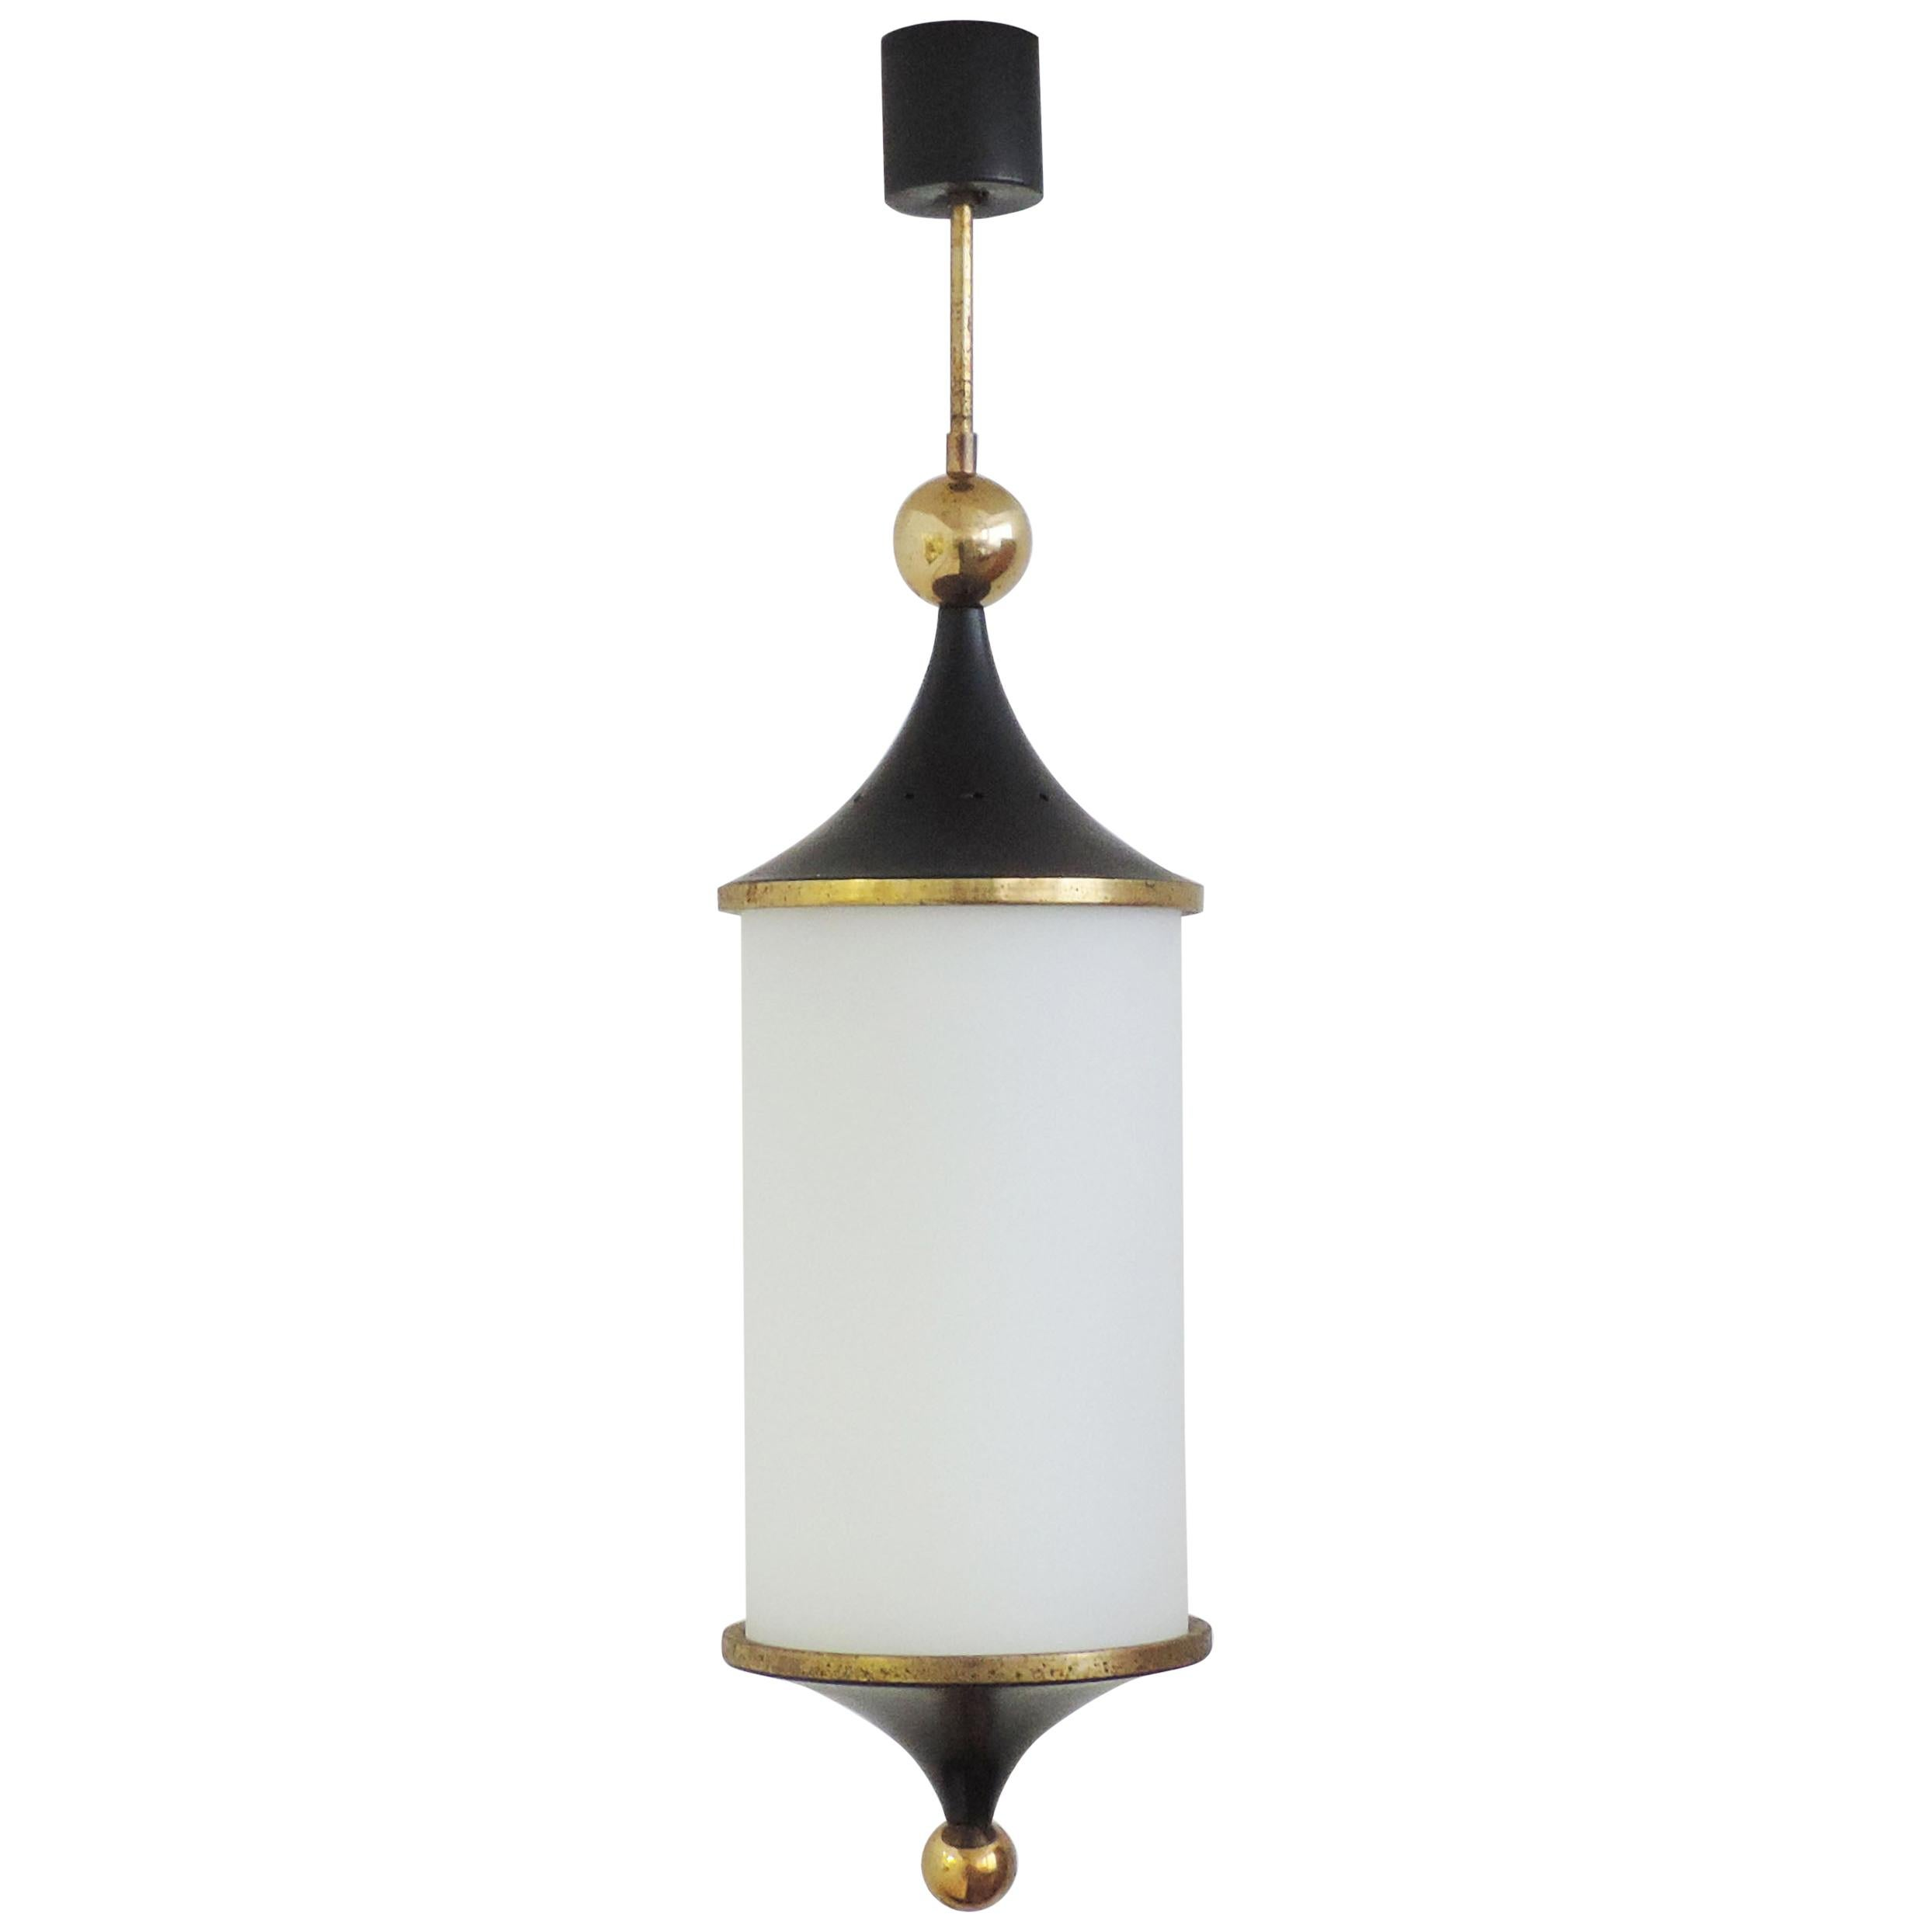 Italian 1950s Black and Brass Pendant